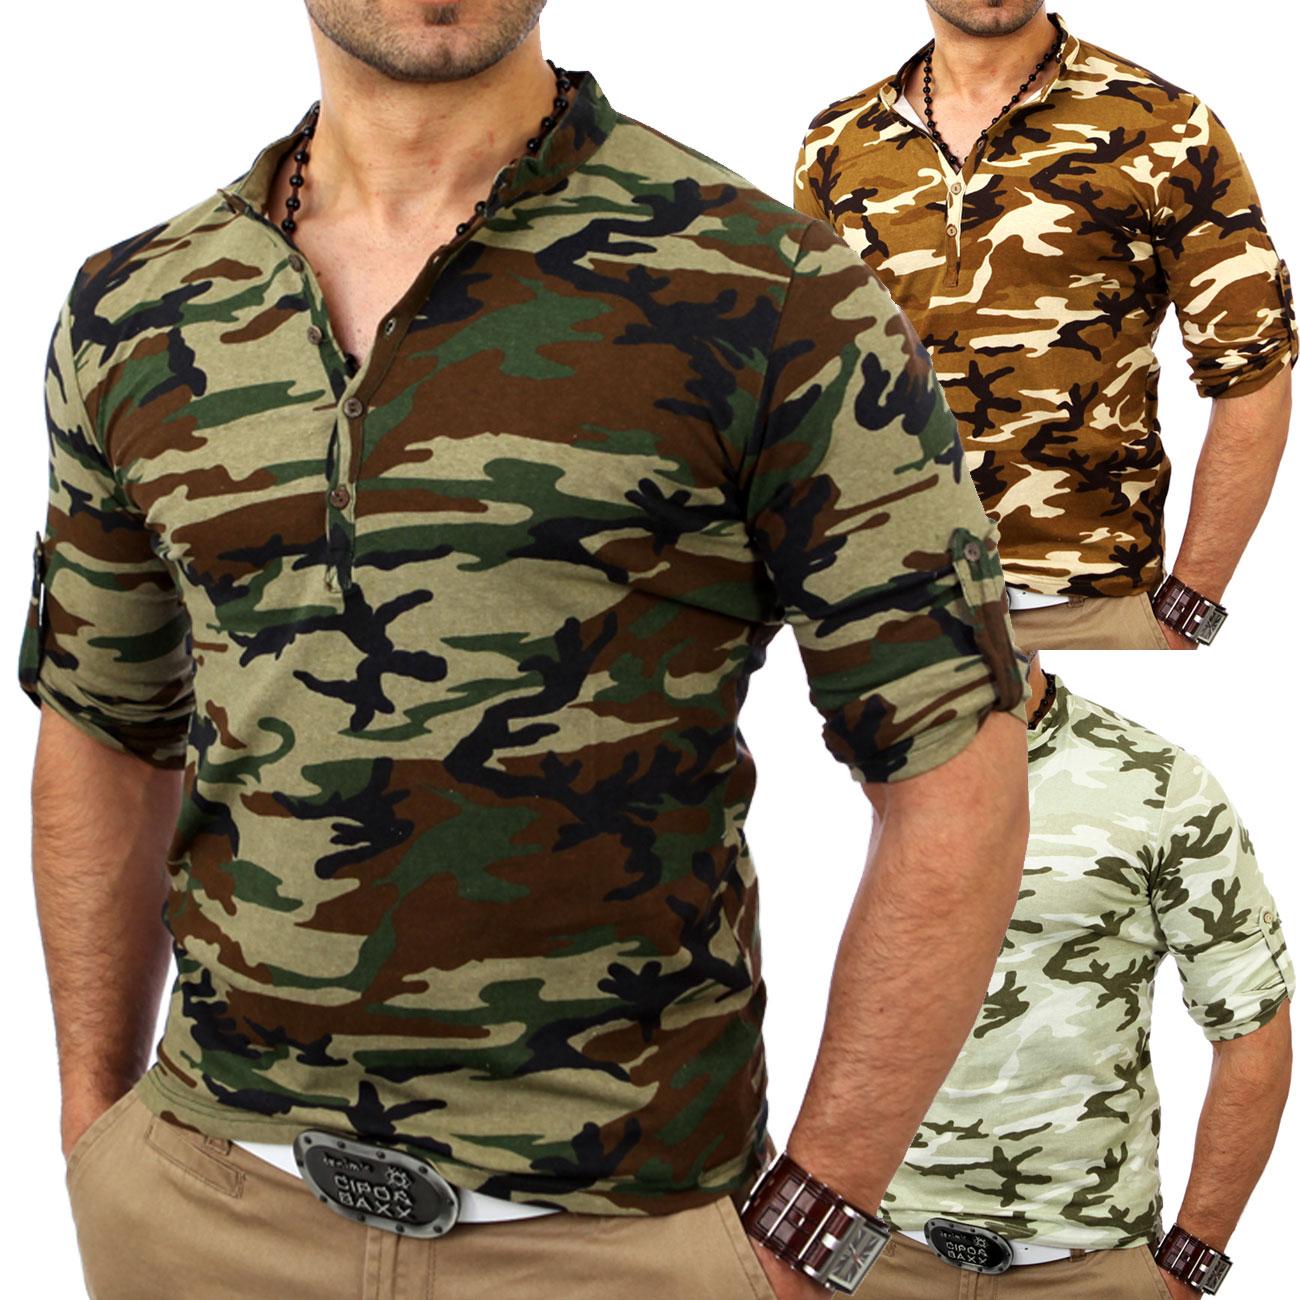 kickdown herren camouflage longsleeve longshirt t shirt. Black Bedroom Furniture Sets. Home Design Ideas